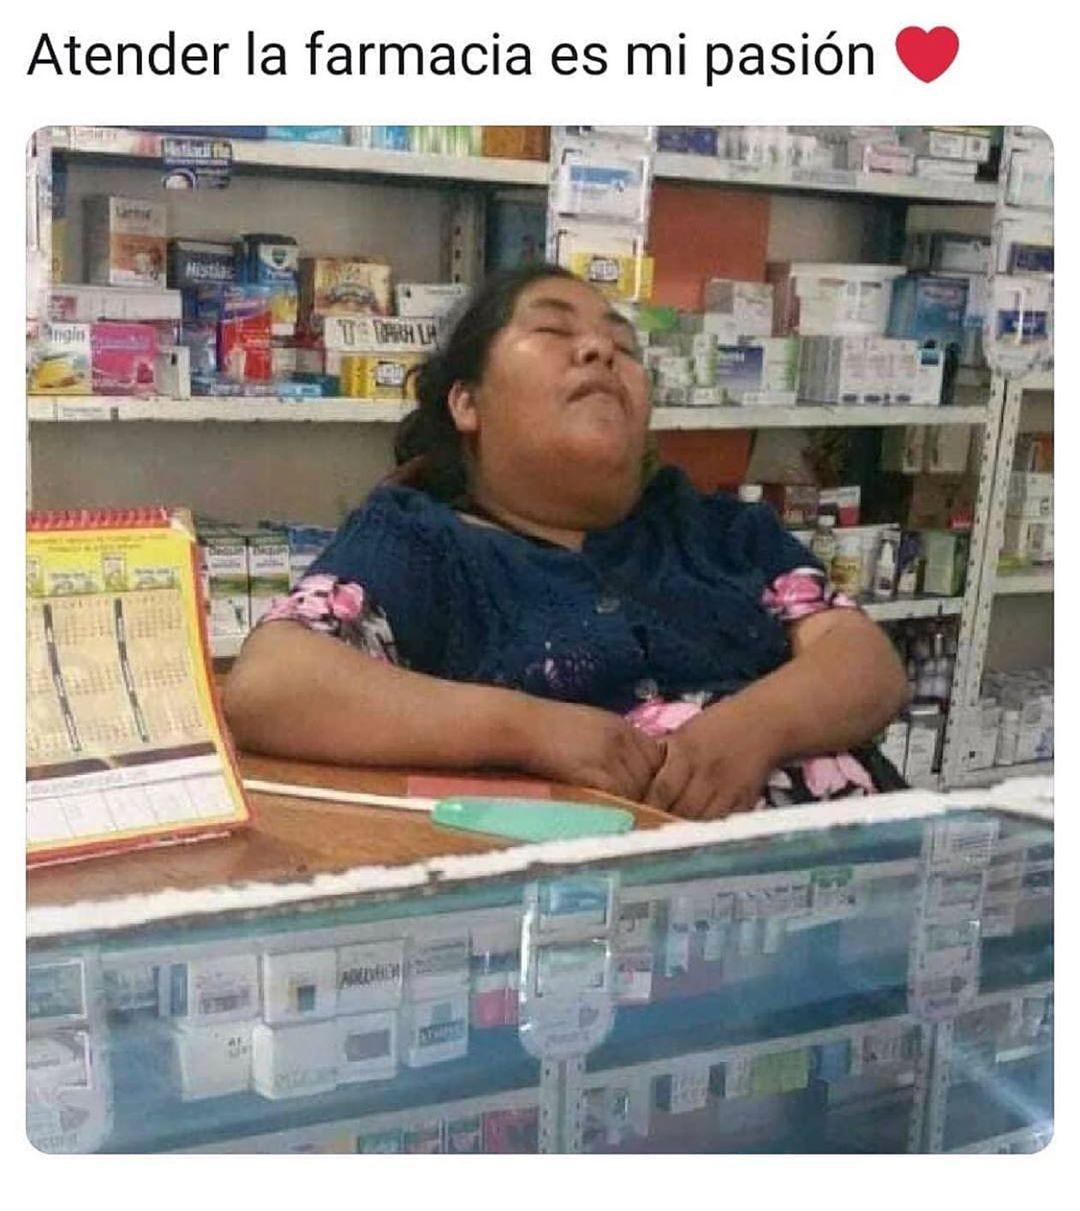 Atender la farmacia es mi pasión.